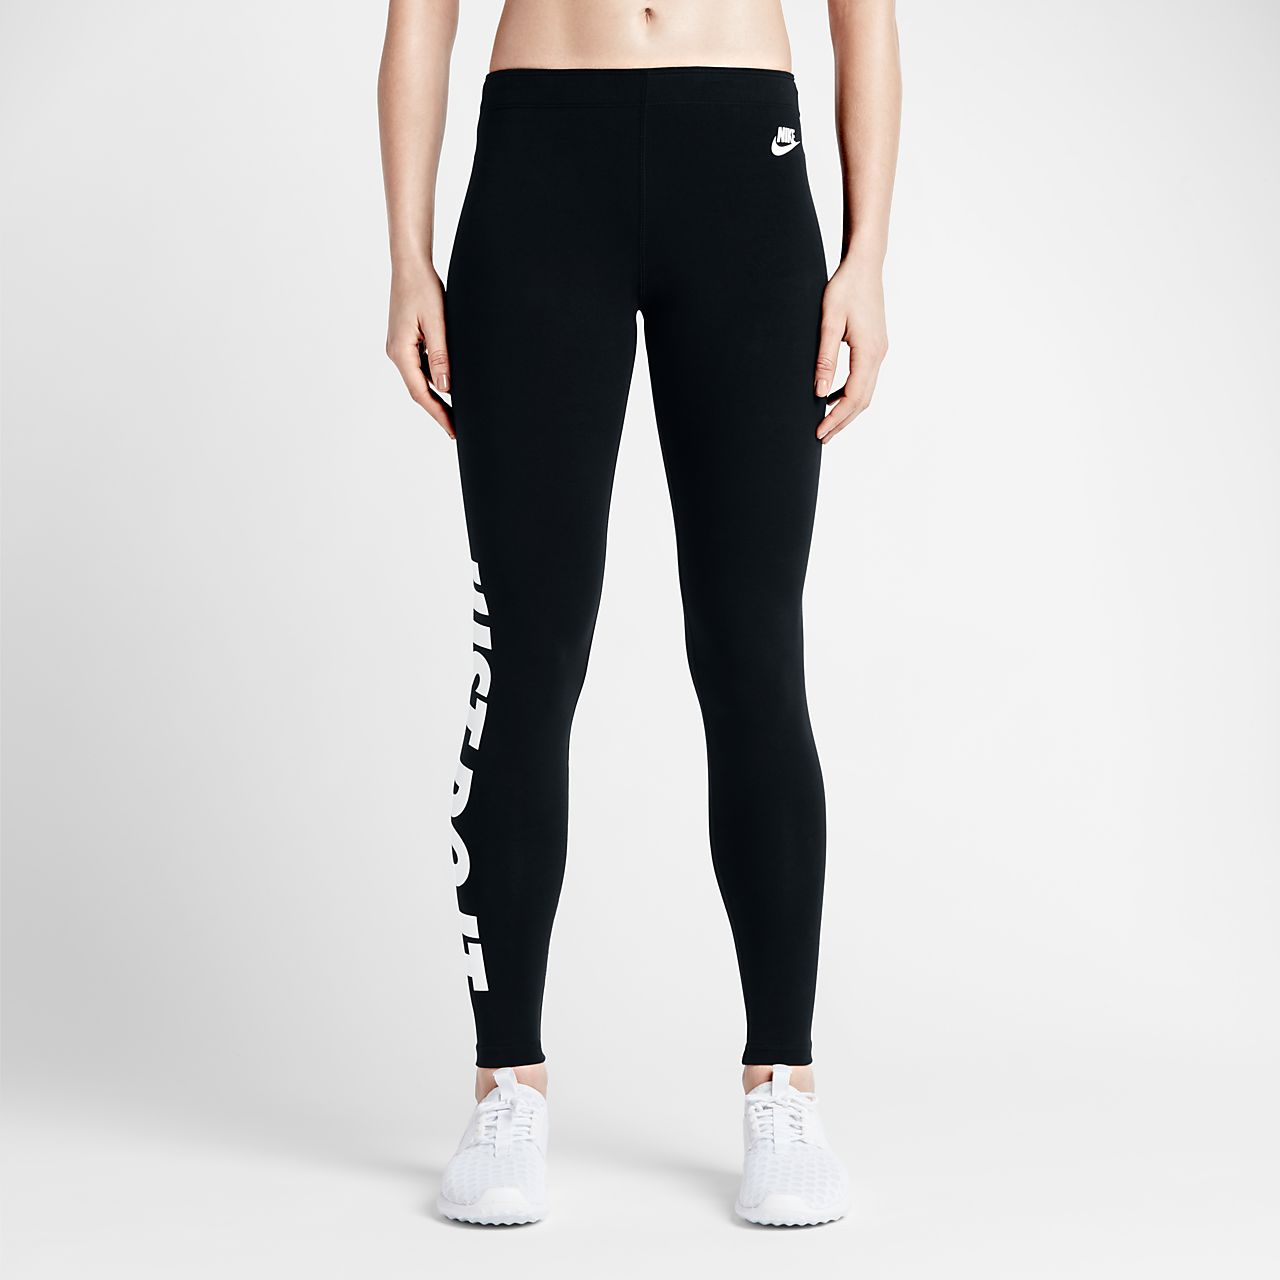 18dc2ac67caa23 Nike Sportswear Leg-A-See Women's Leggings. Nike.com AU